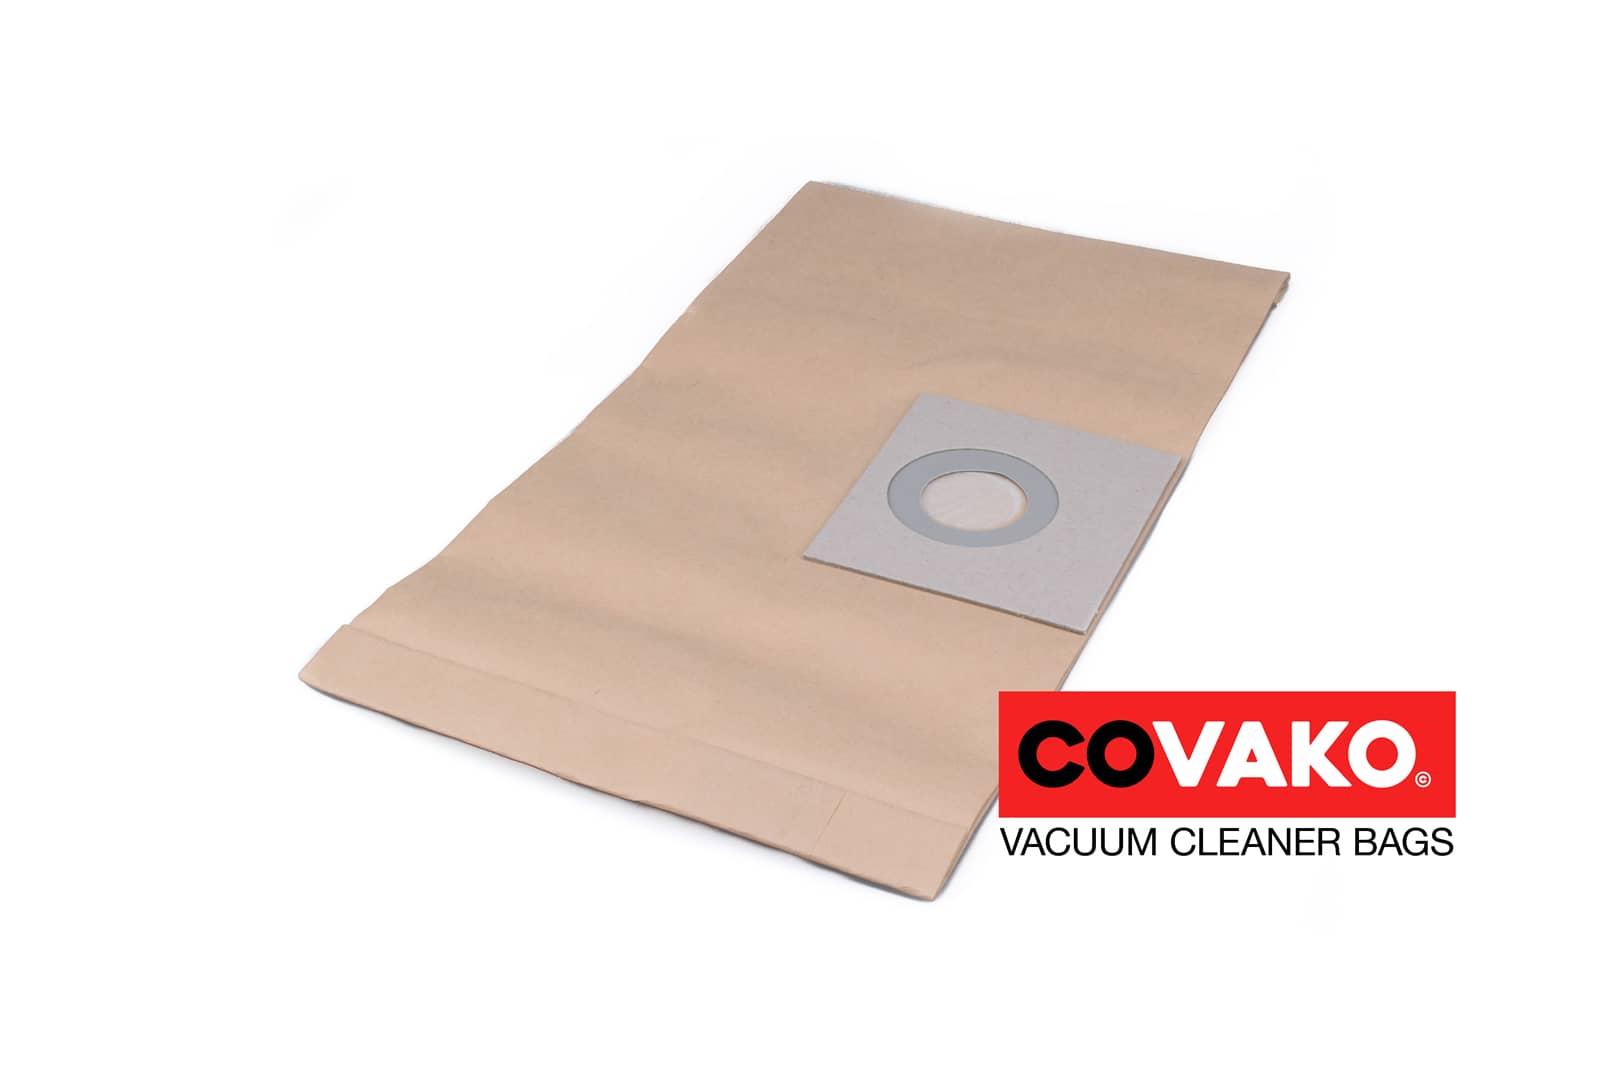 Soteco Box / Paper - Soteco vacuum cleaner bags